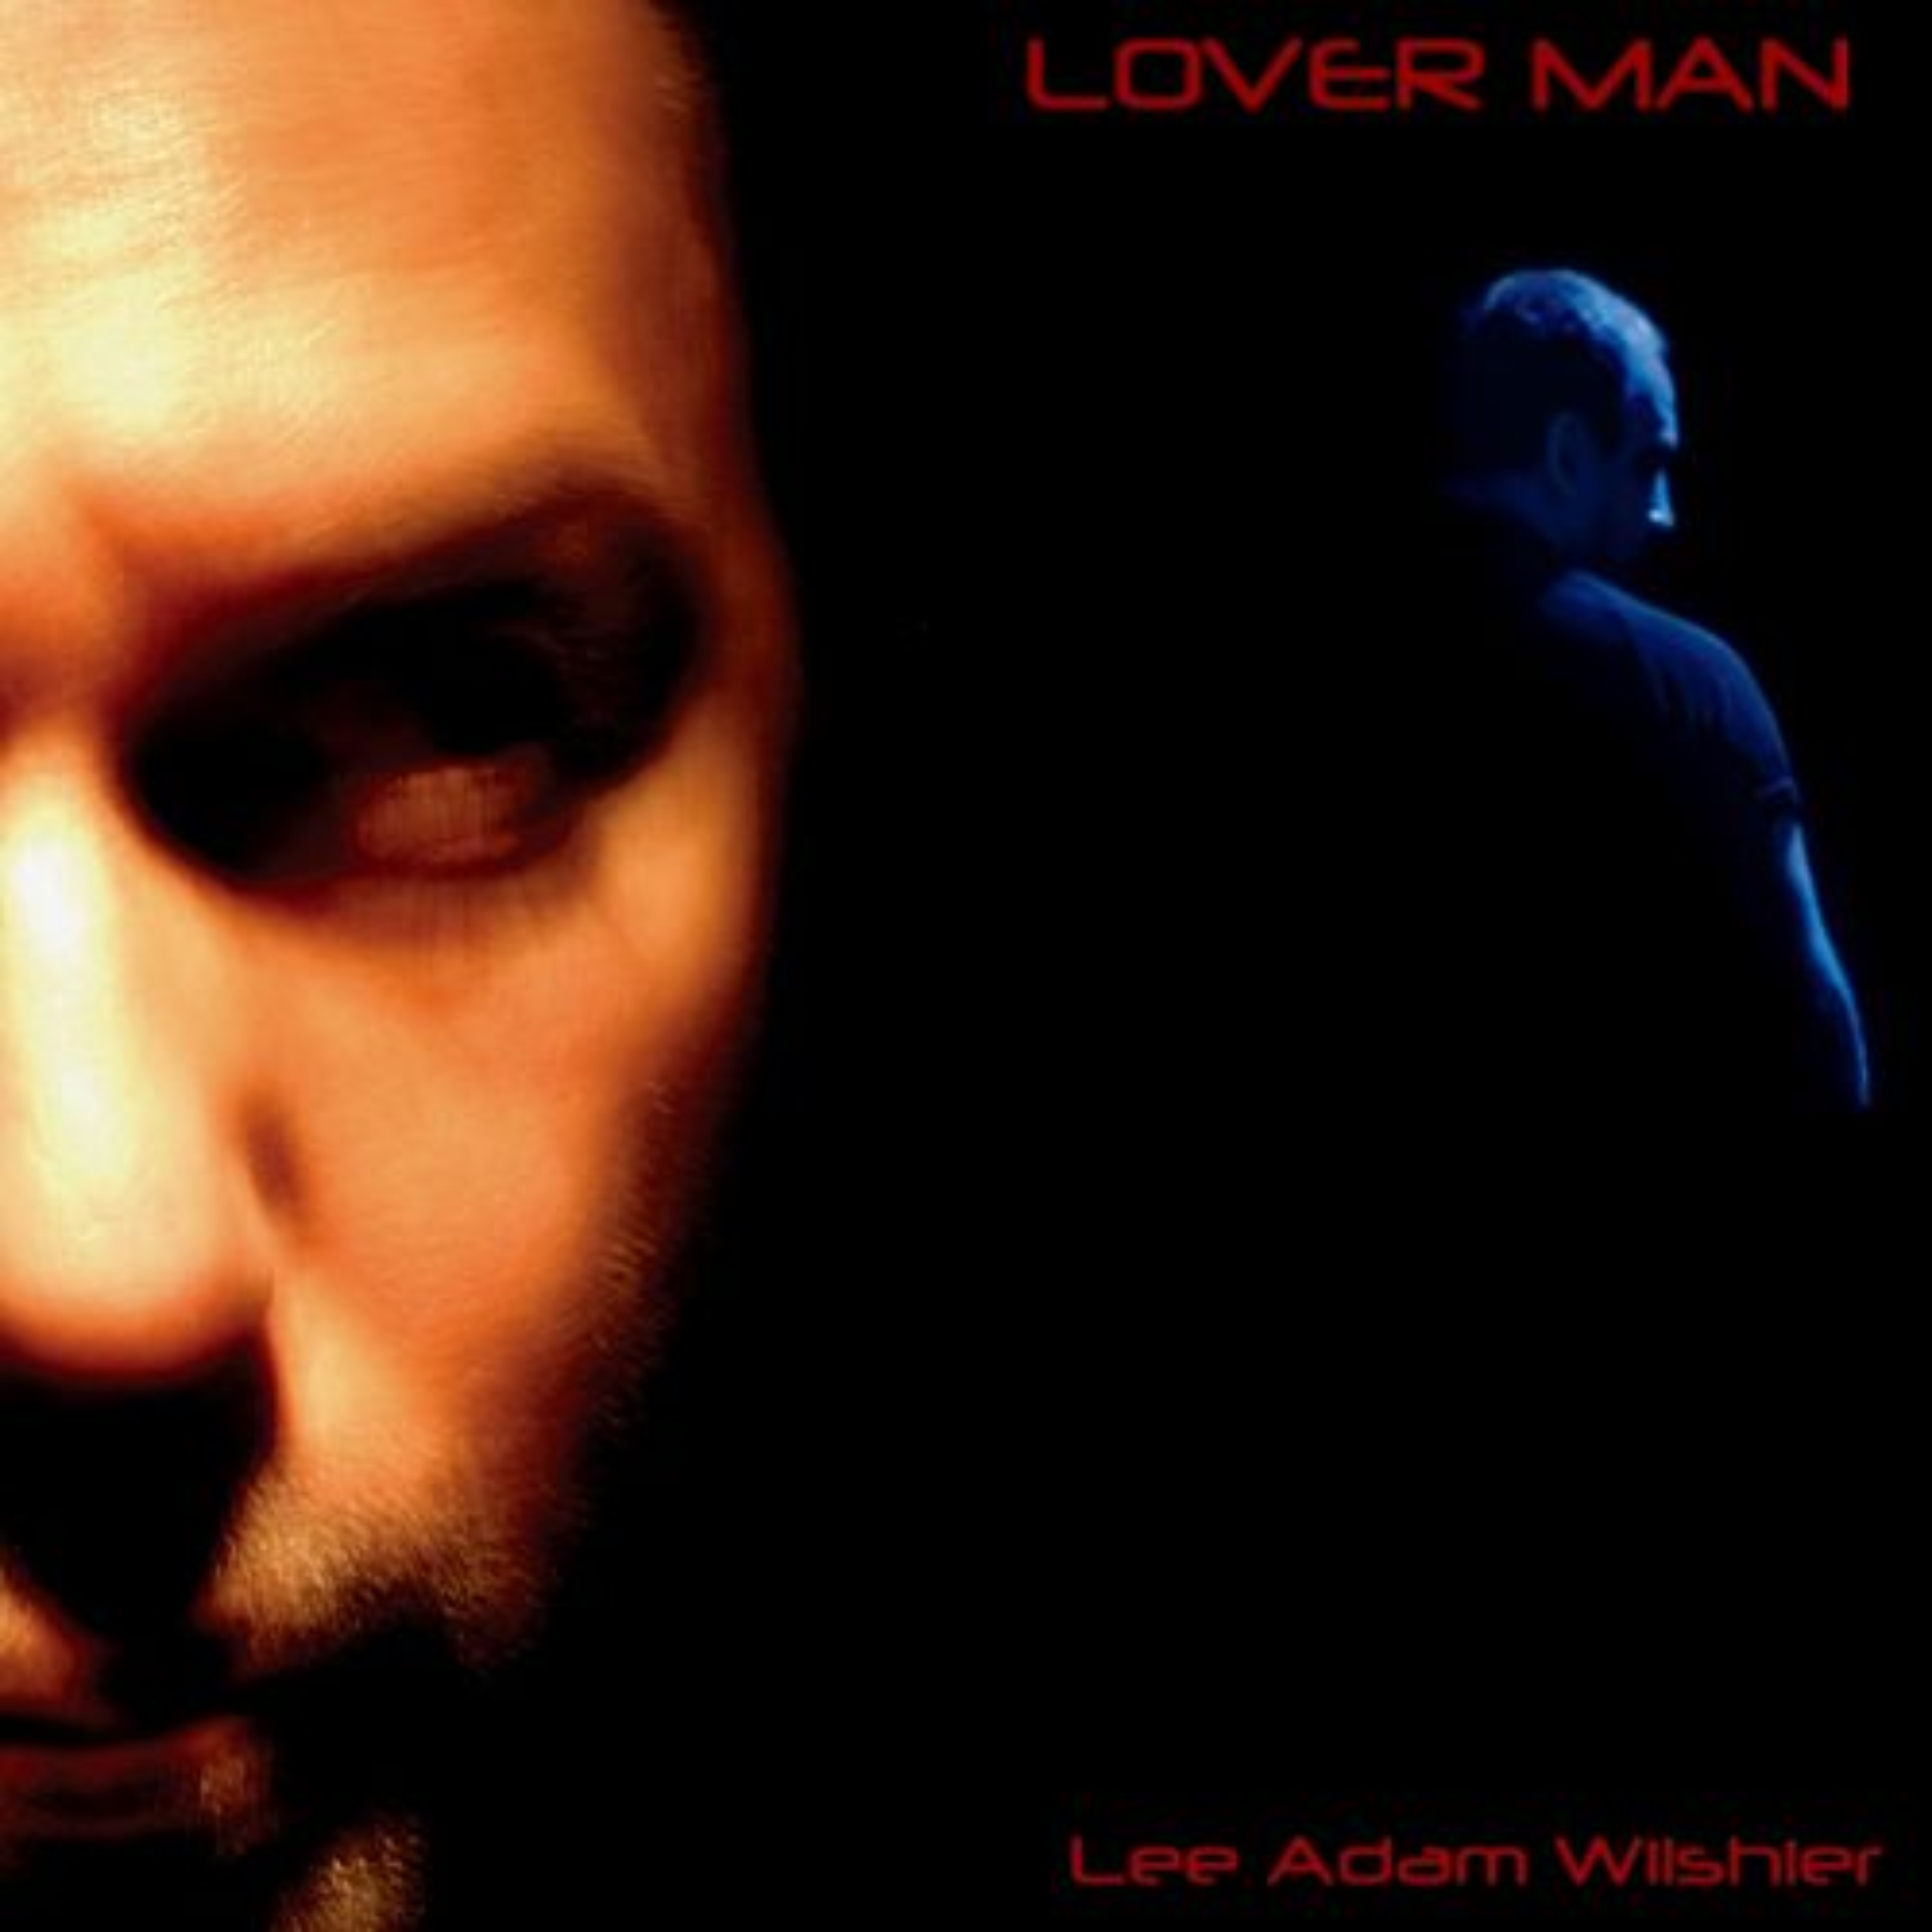 Lover Man by Lee Adam Wilshier